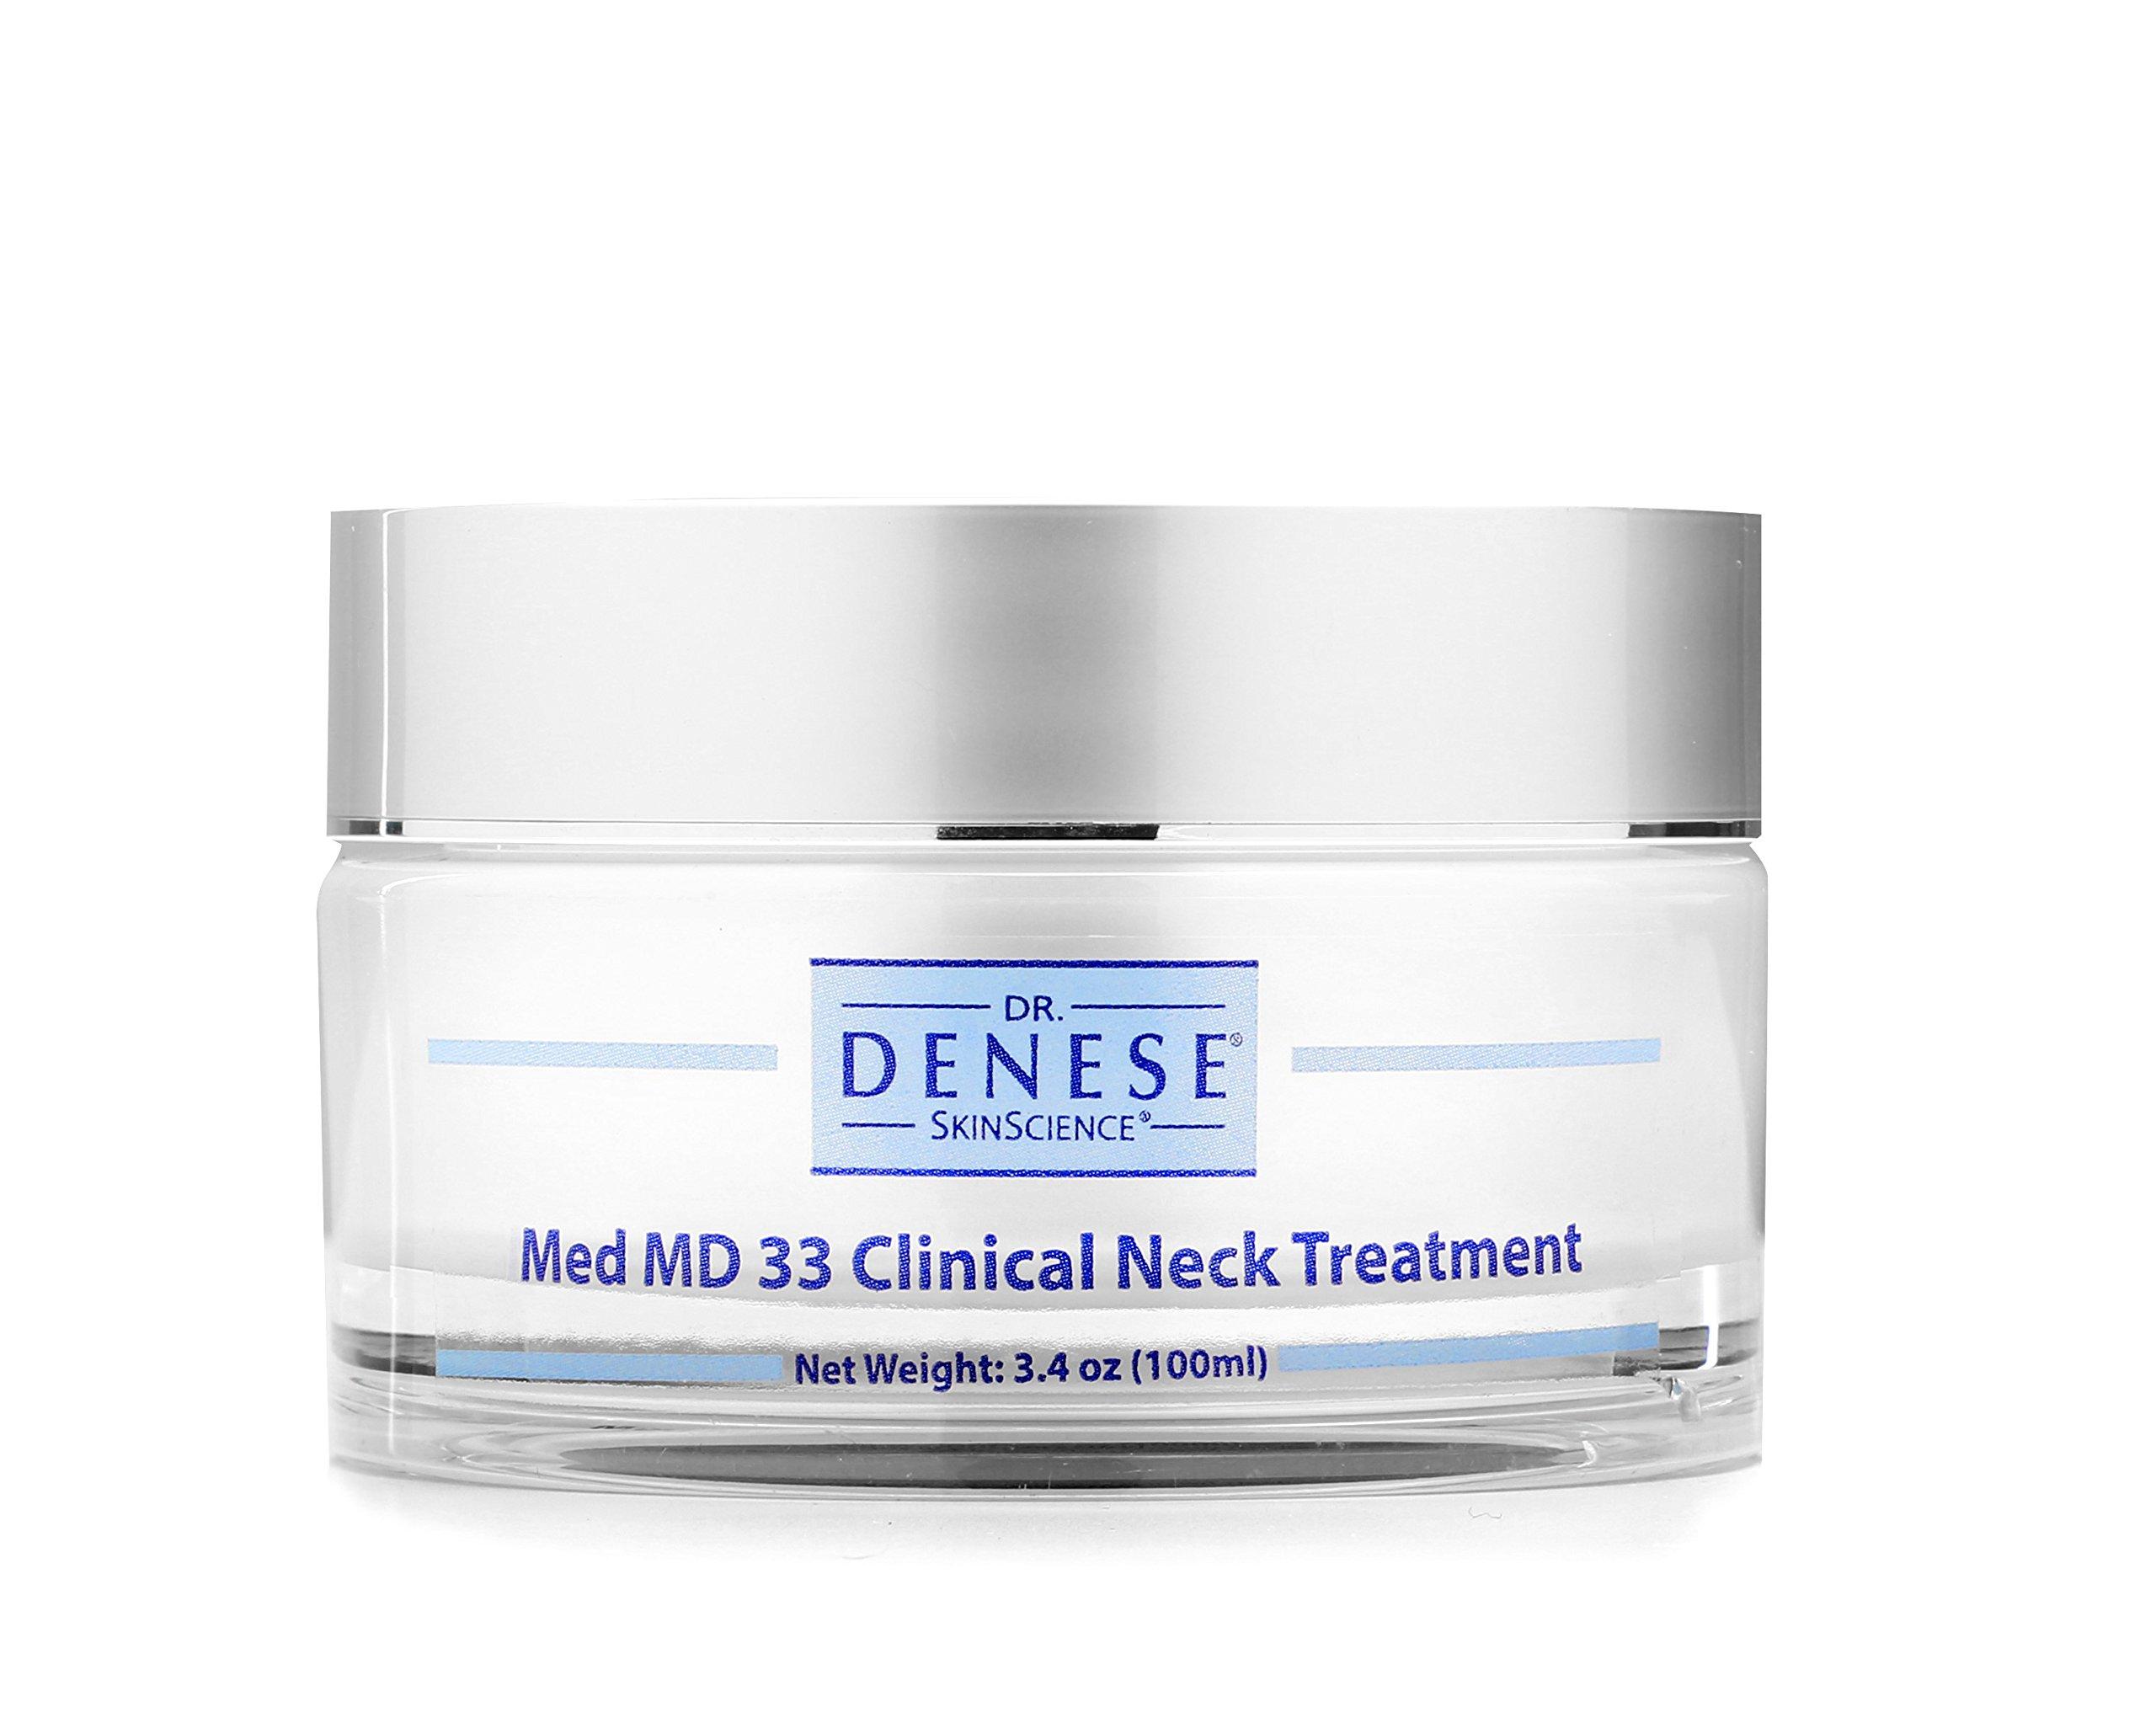 Dr. Denese Med MD 33 Clinical Neck Treatment (3.4 OZ)